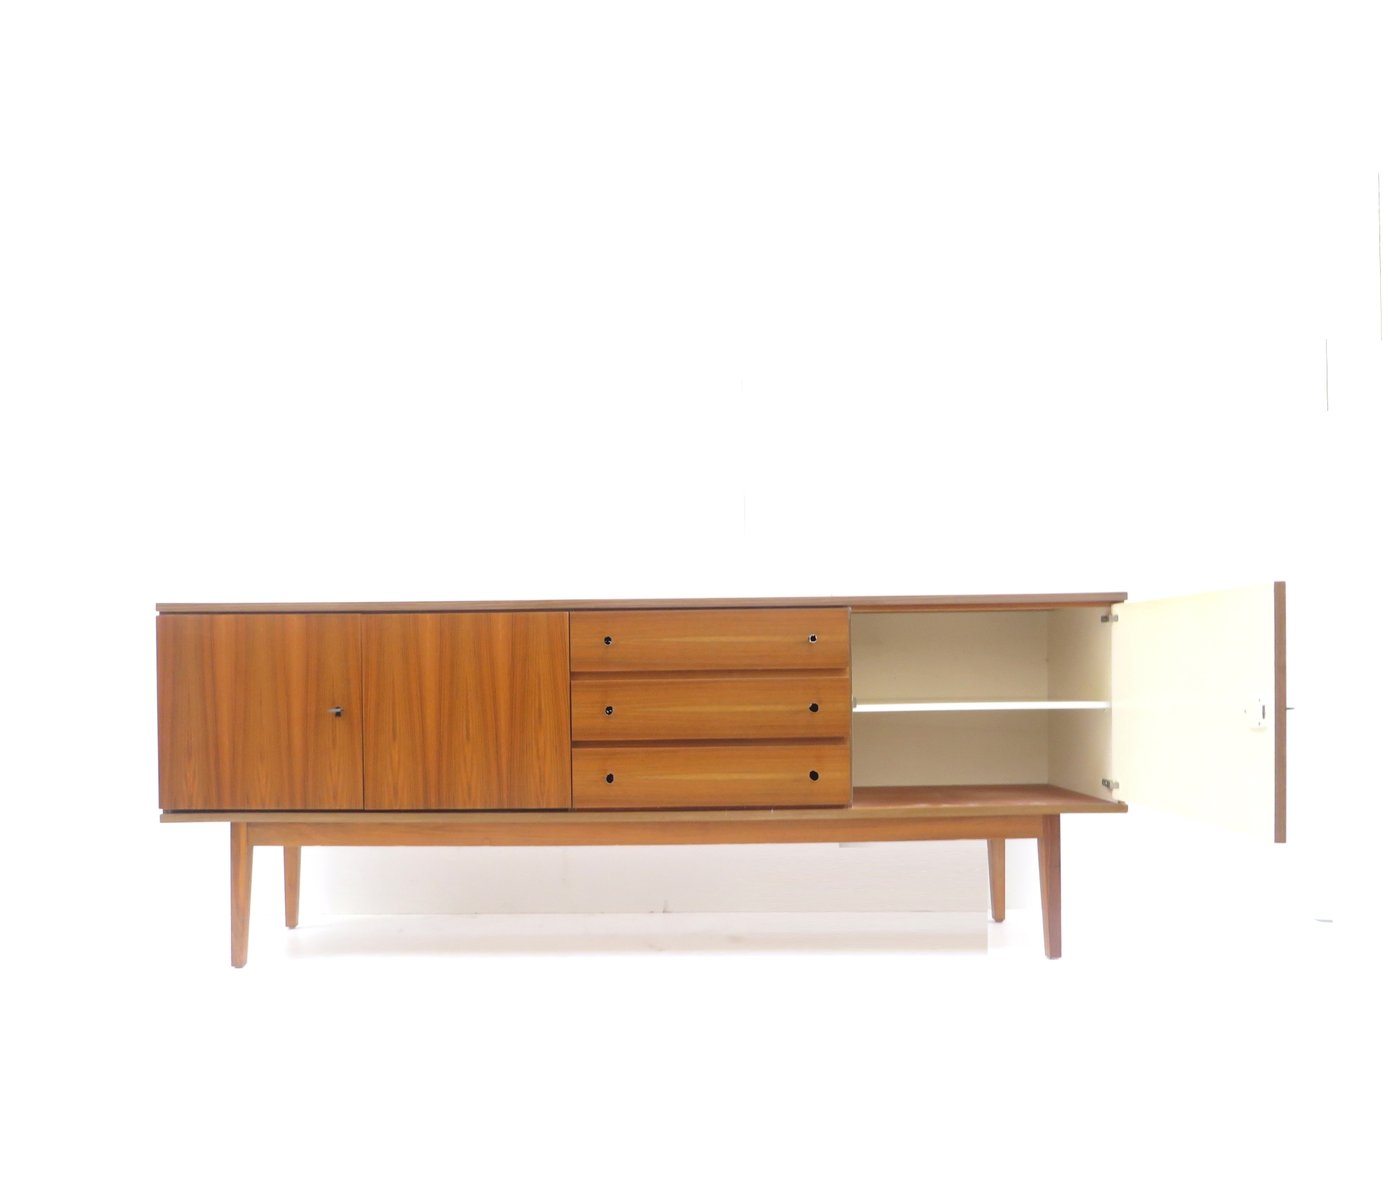 gro es mid century sideboard aus teak bei pamono kaufen. Black Bedroom Furniture Sets. Home Design Ideas